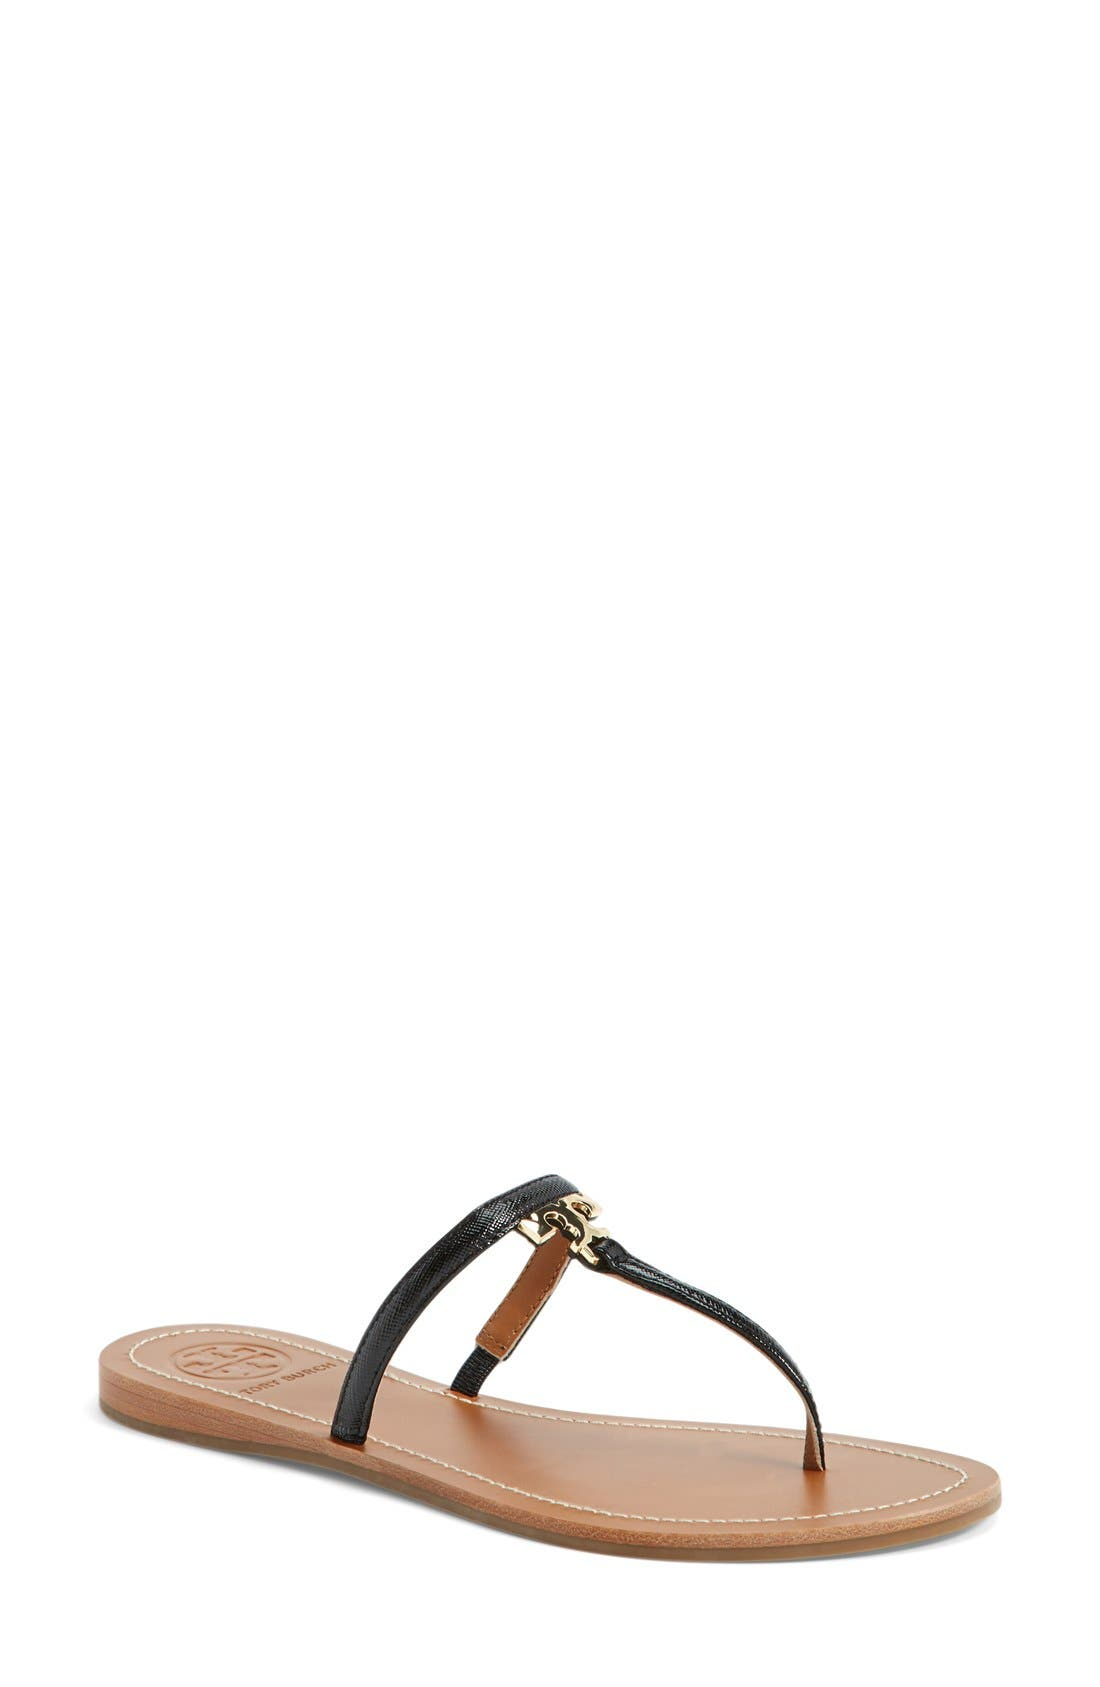 Main Image - Tory Burch 'T' Logo Leather Thong Sandal (Women)